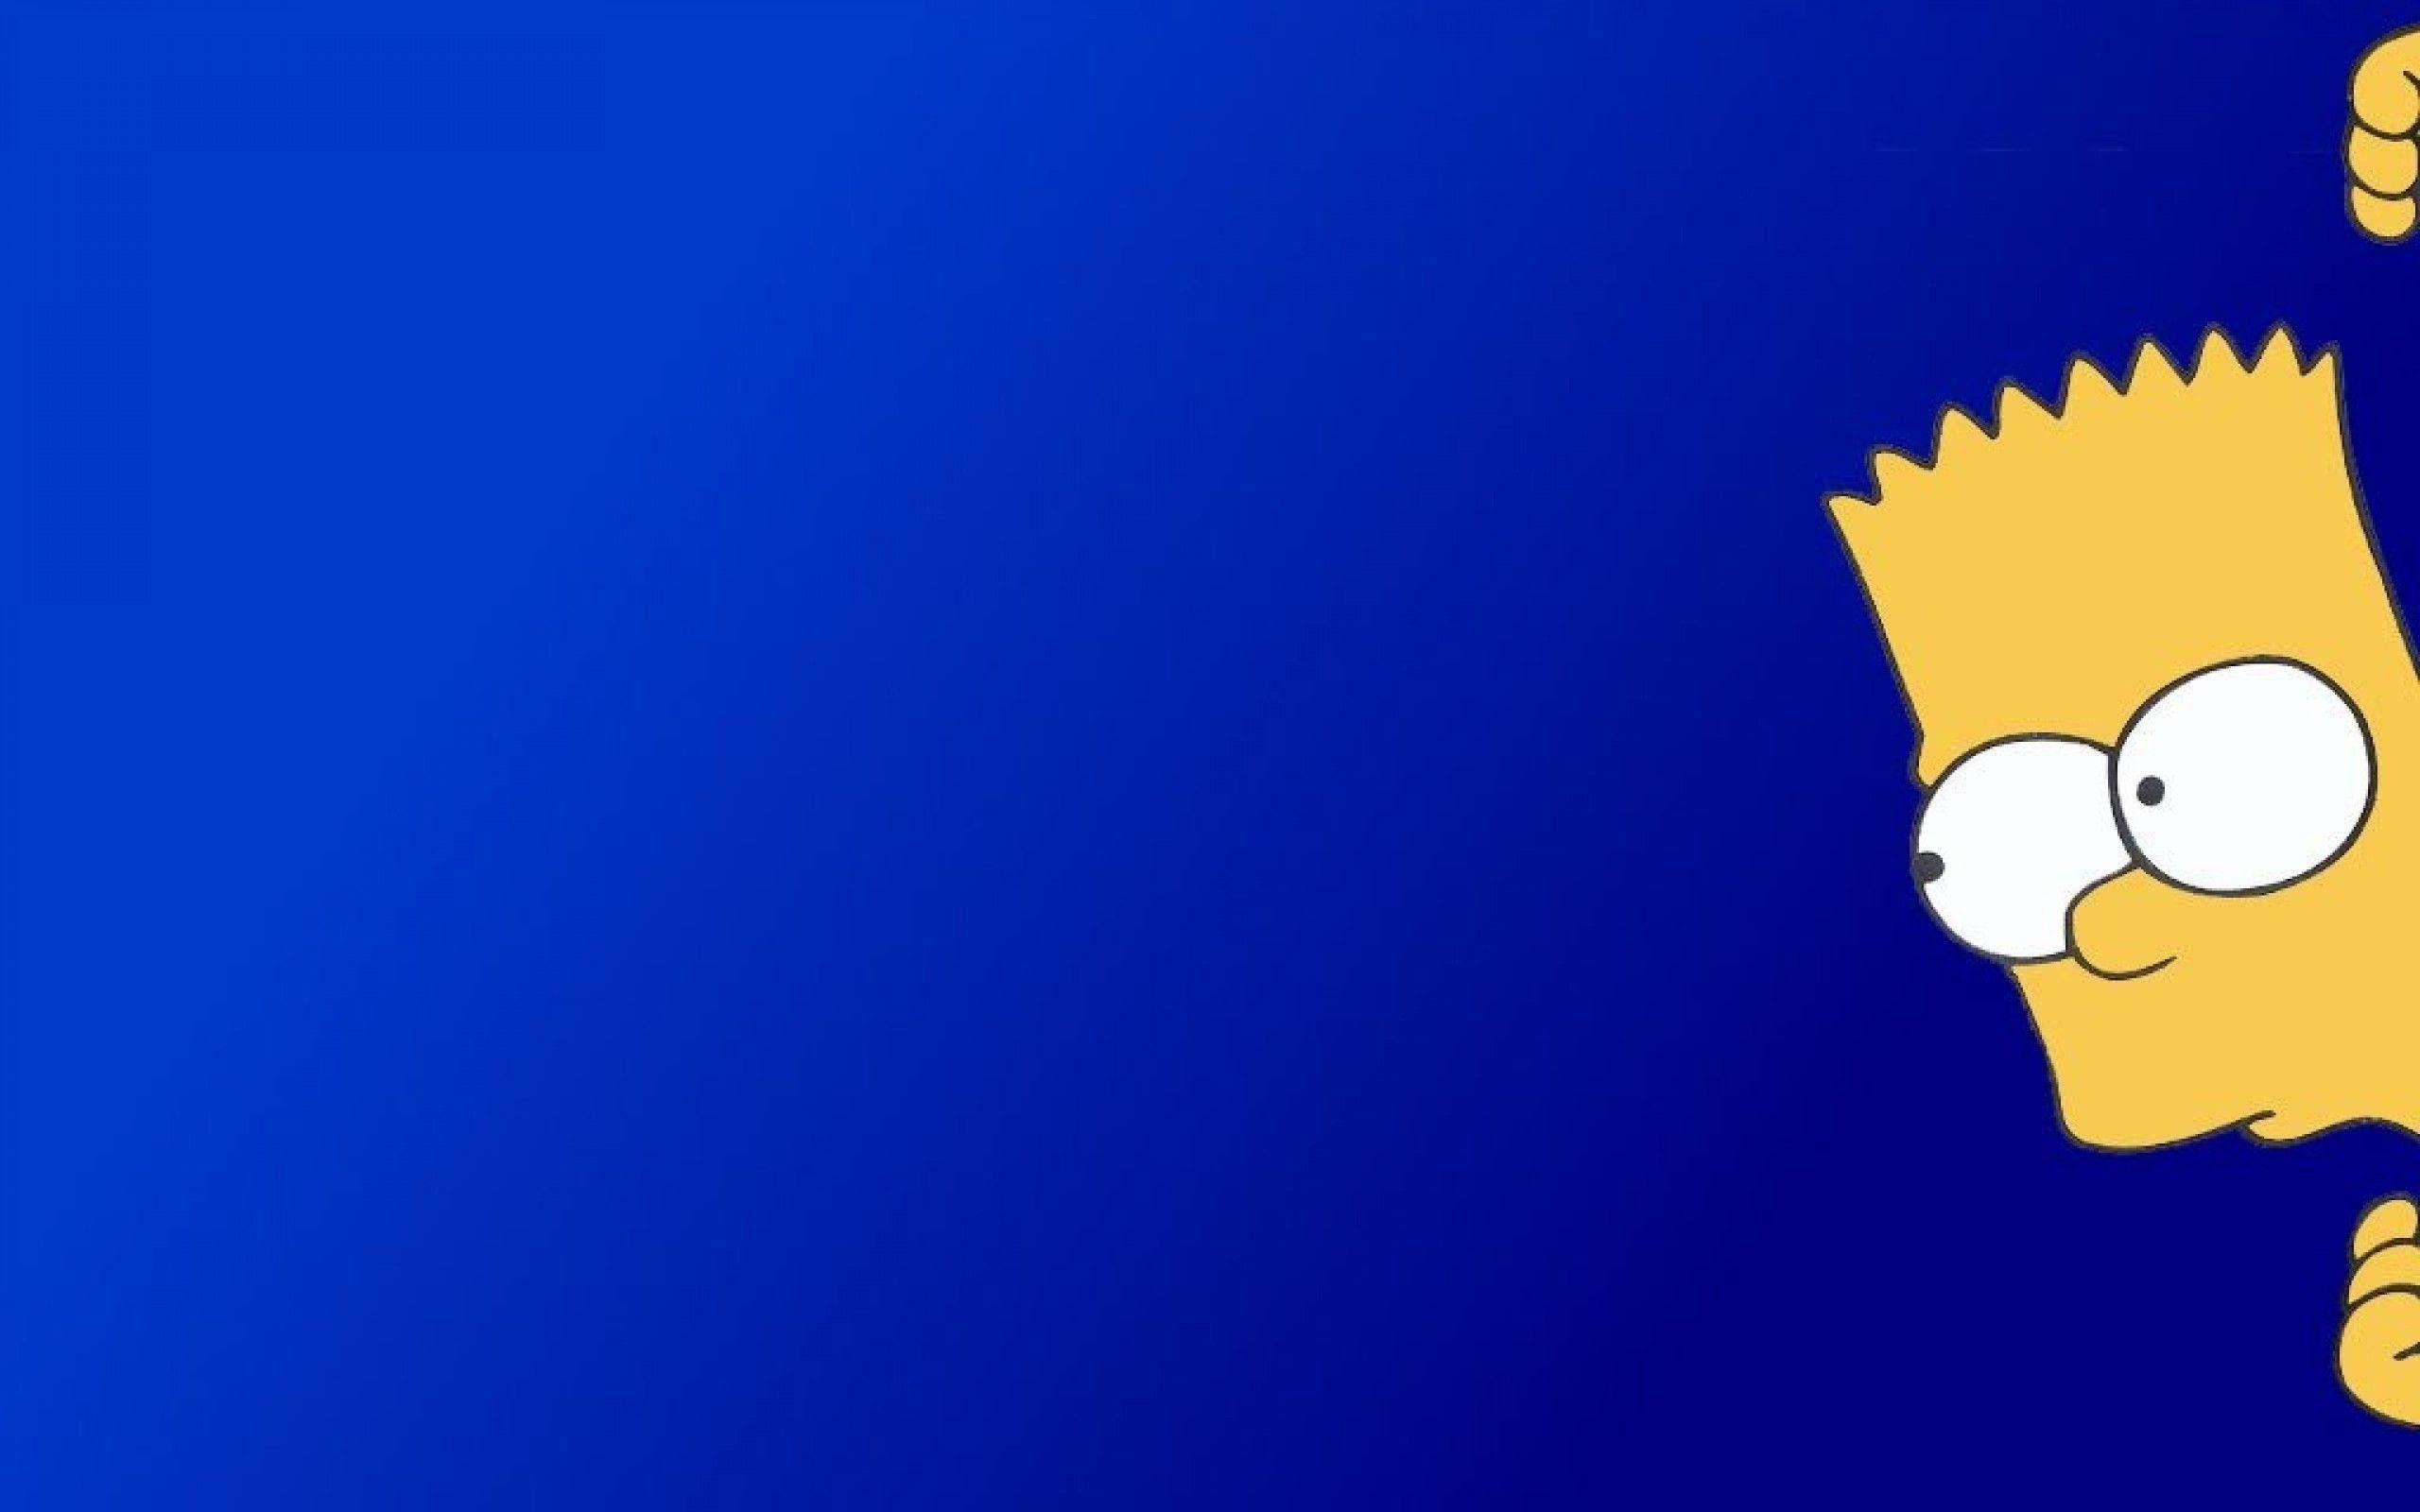 Bart Simpson Desktop Wallpapers Top Free Bart Simpson